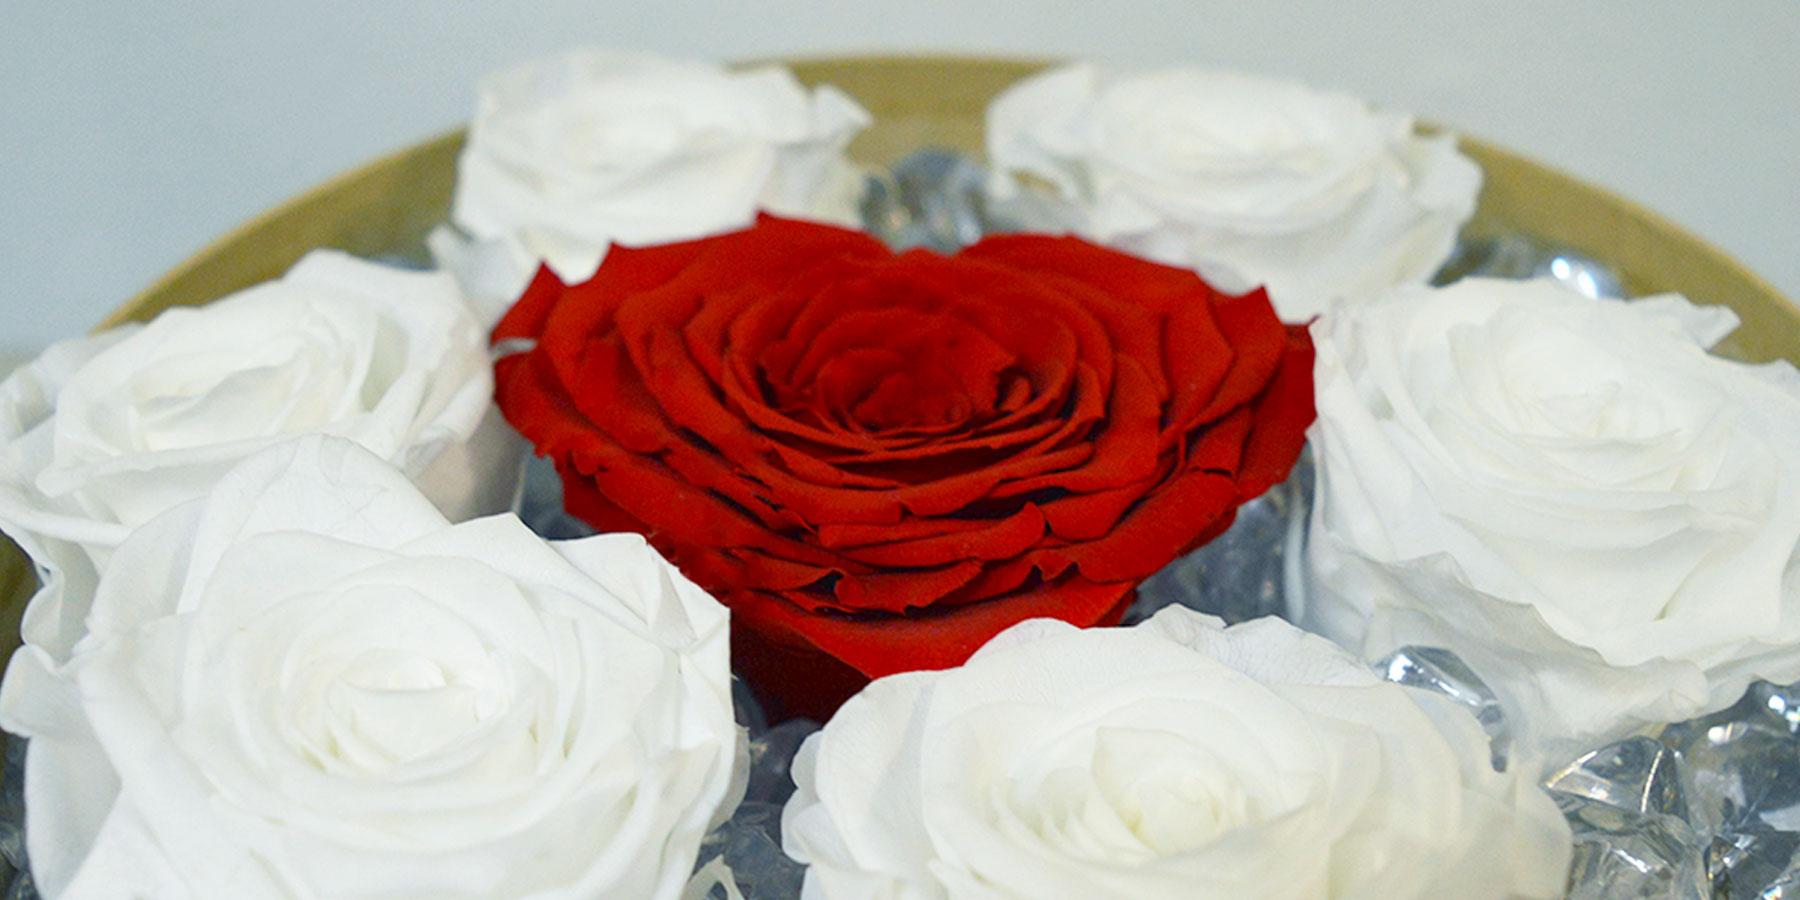 San Valentino si avvicina: regala una rosa eterna